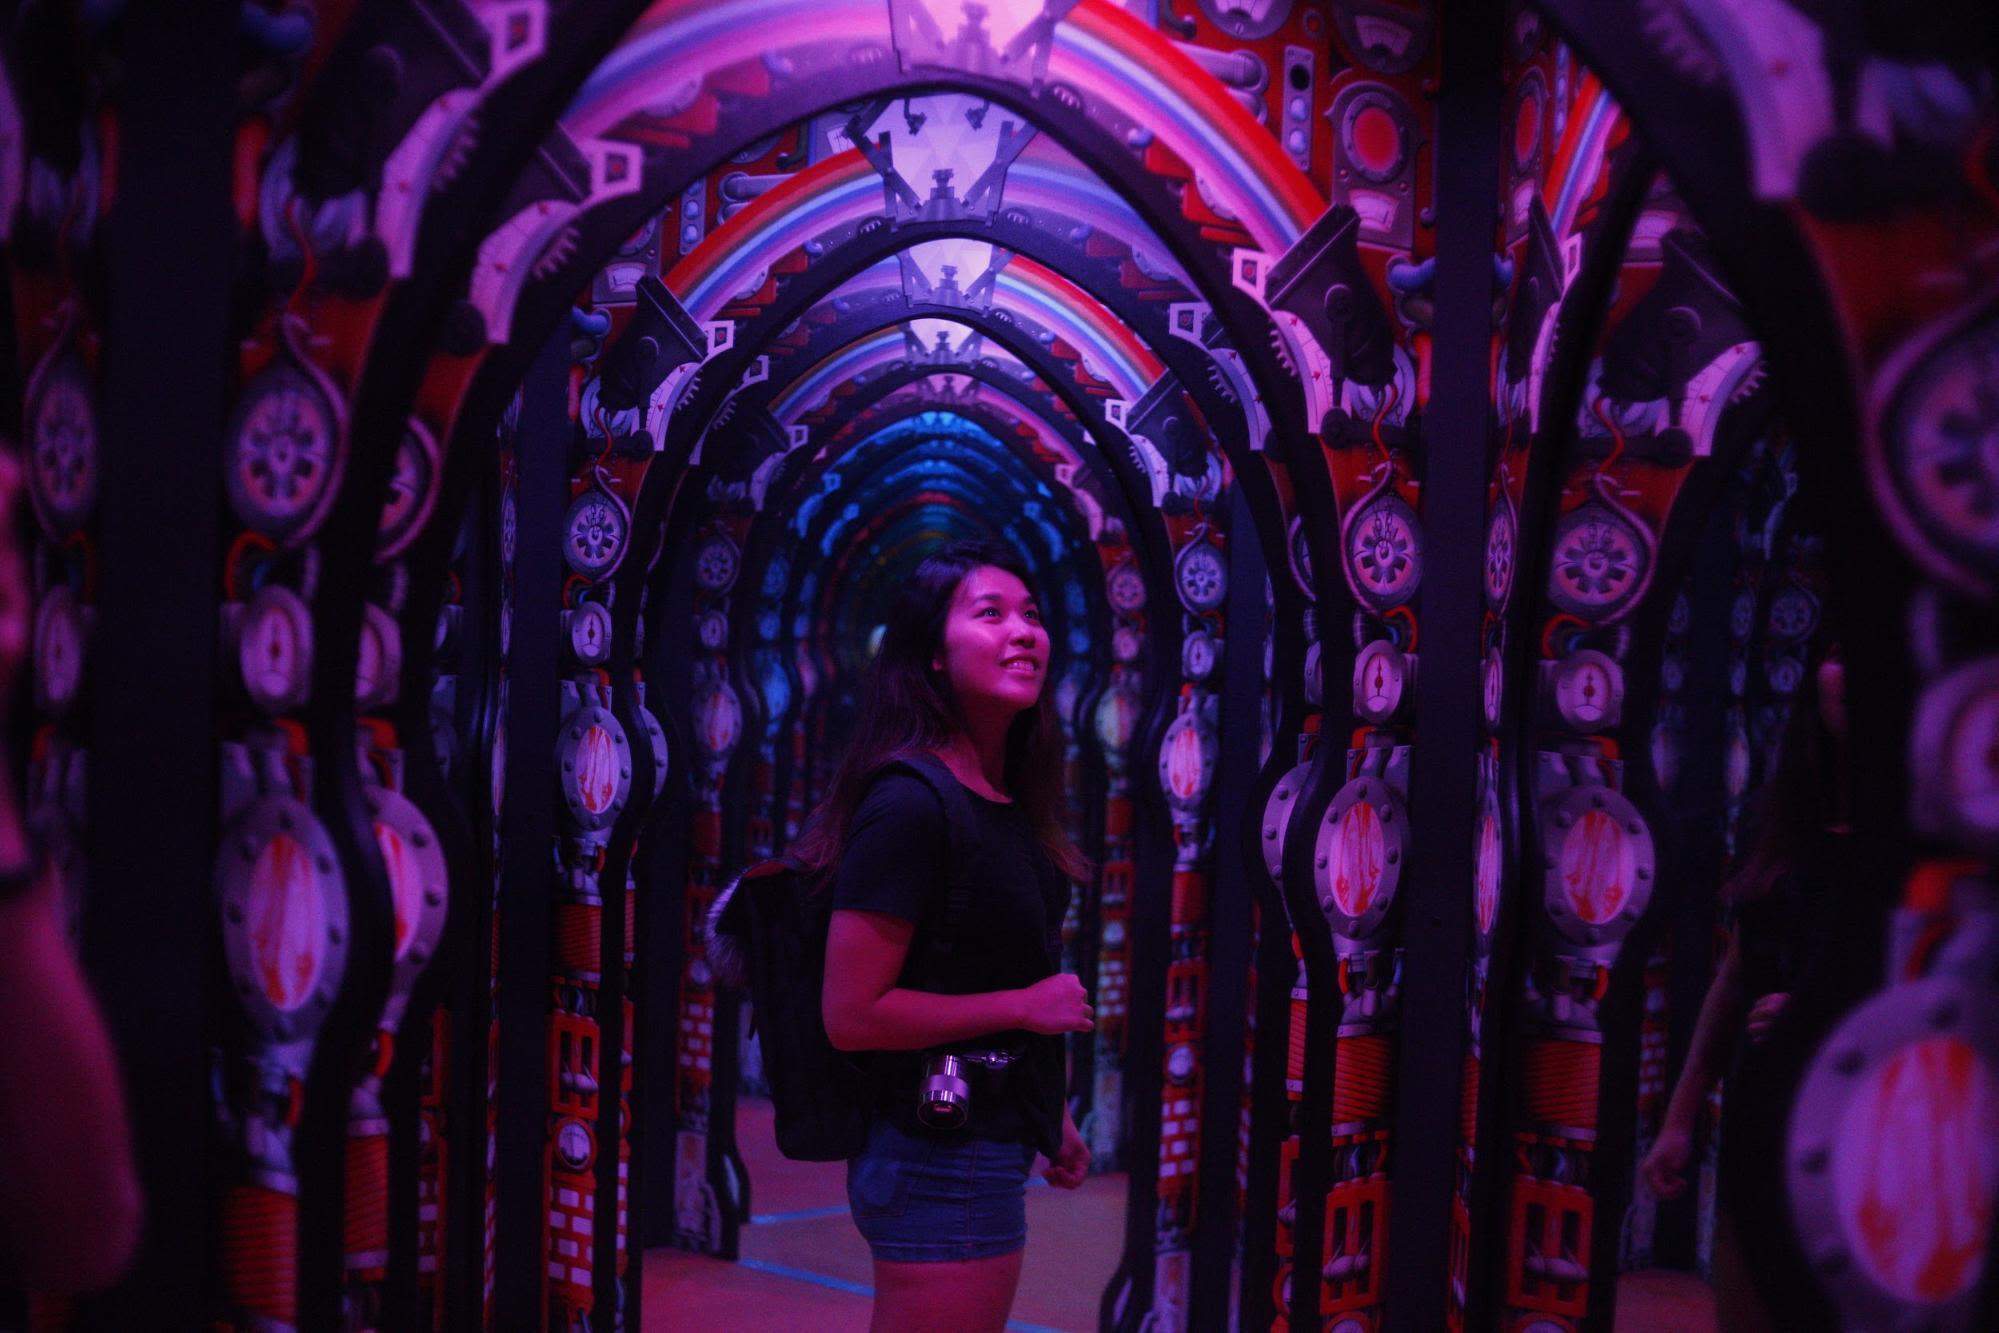 science center singapore mirror maze